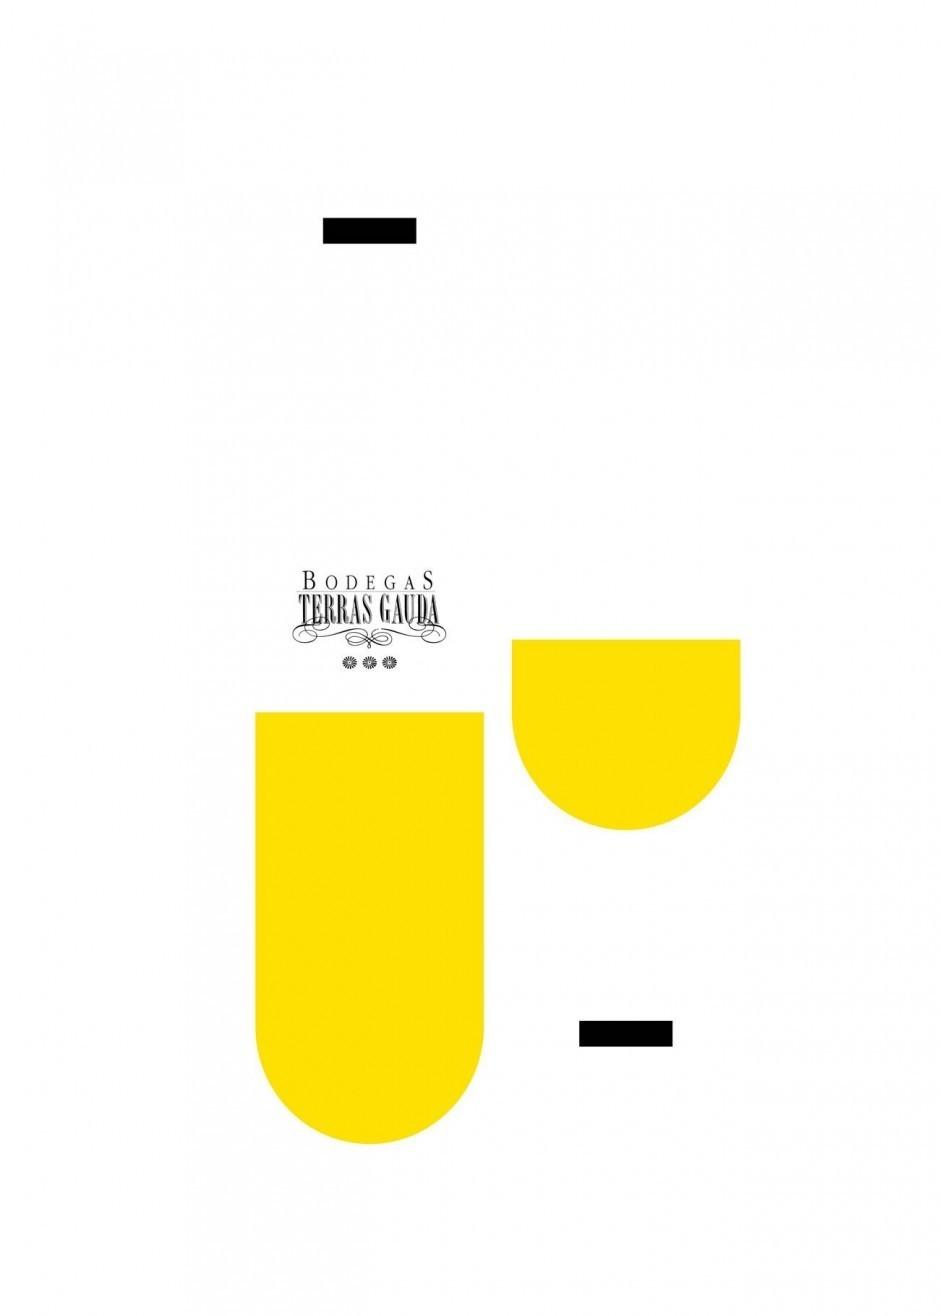 2. Preis Honorable Mention: Toni Ponti Ibars (Lleida, Katalonien)